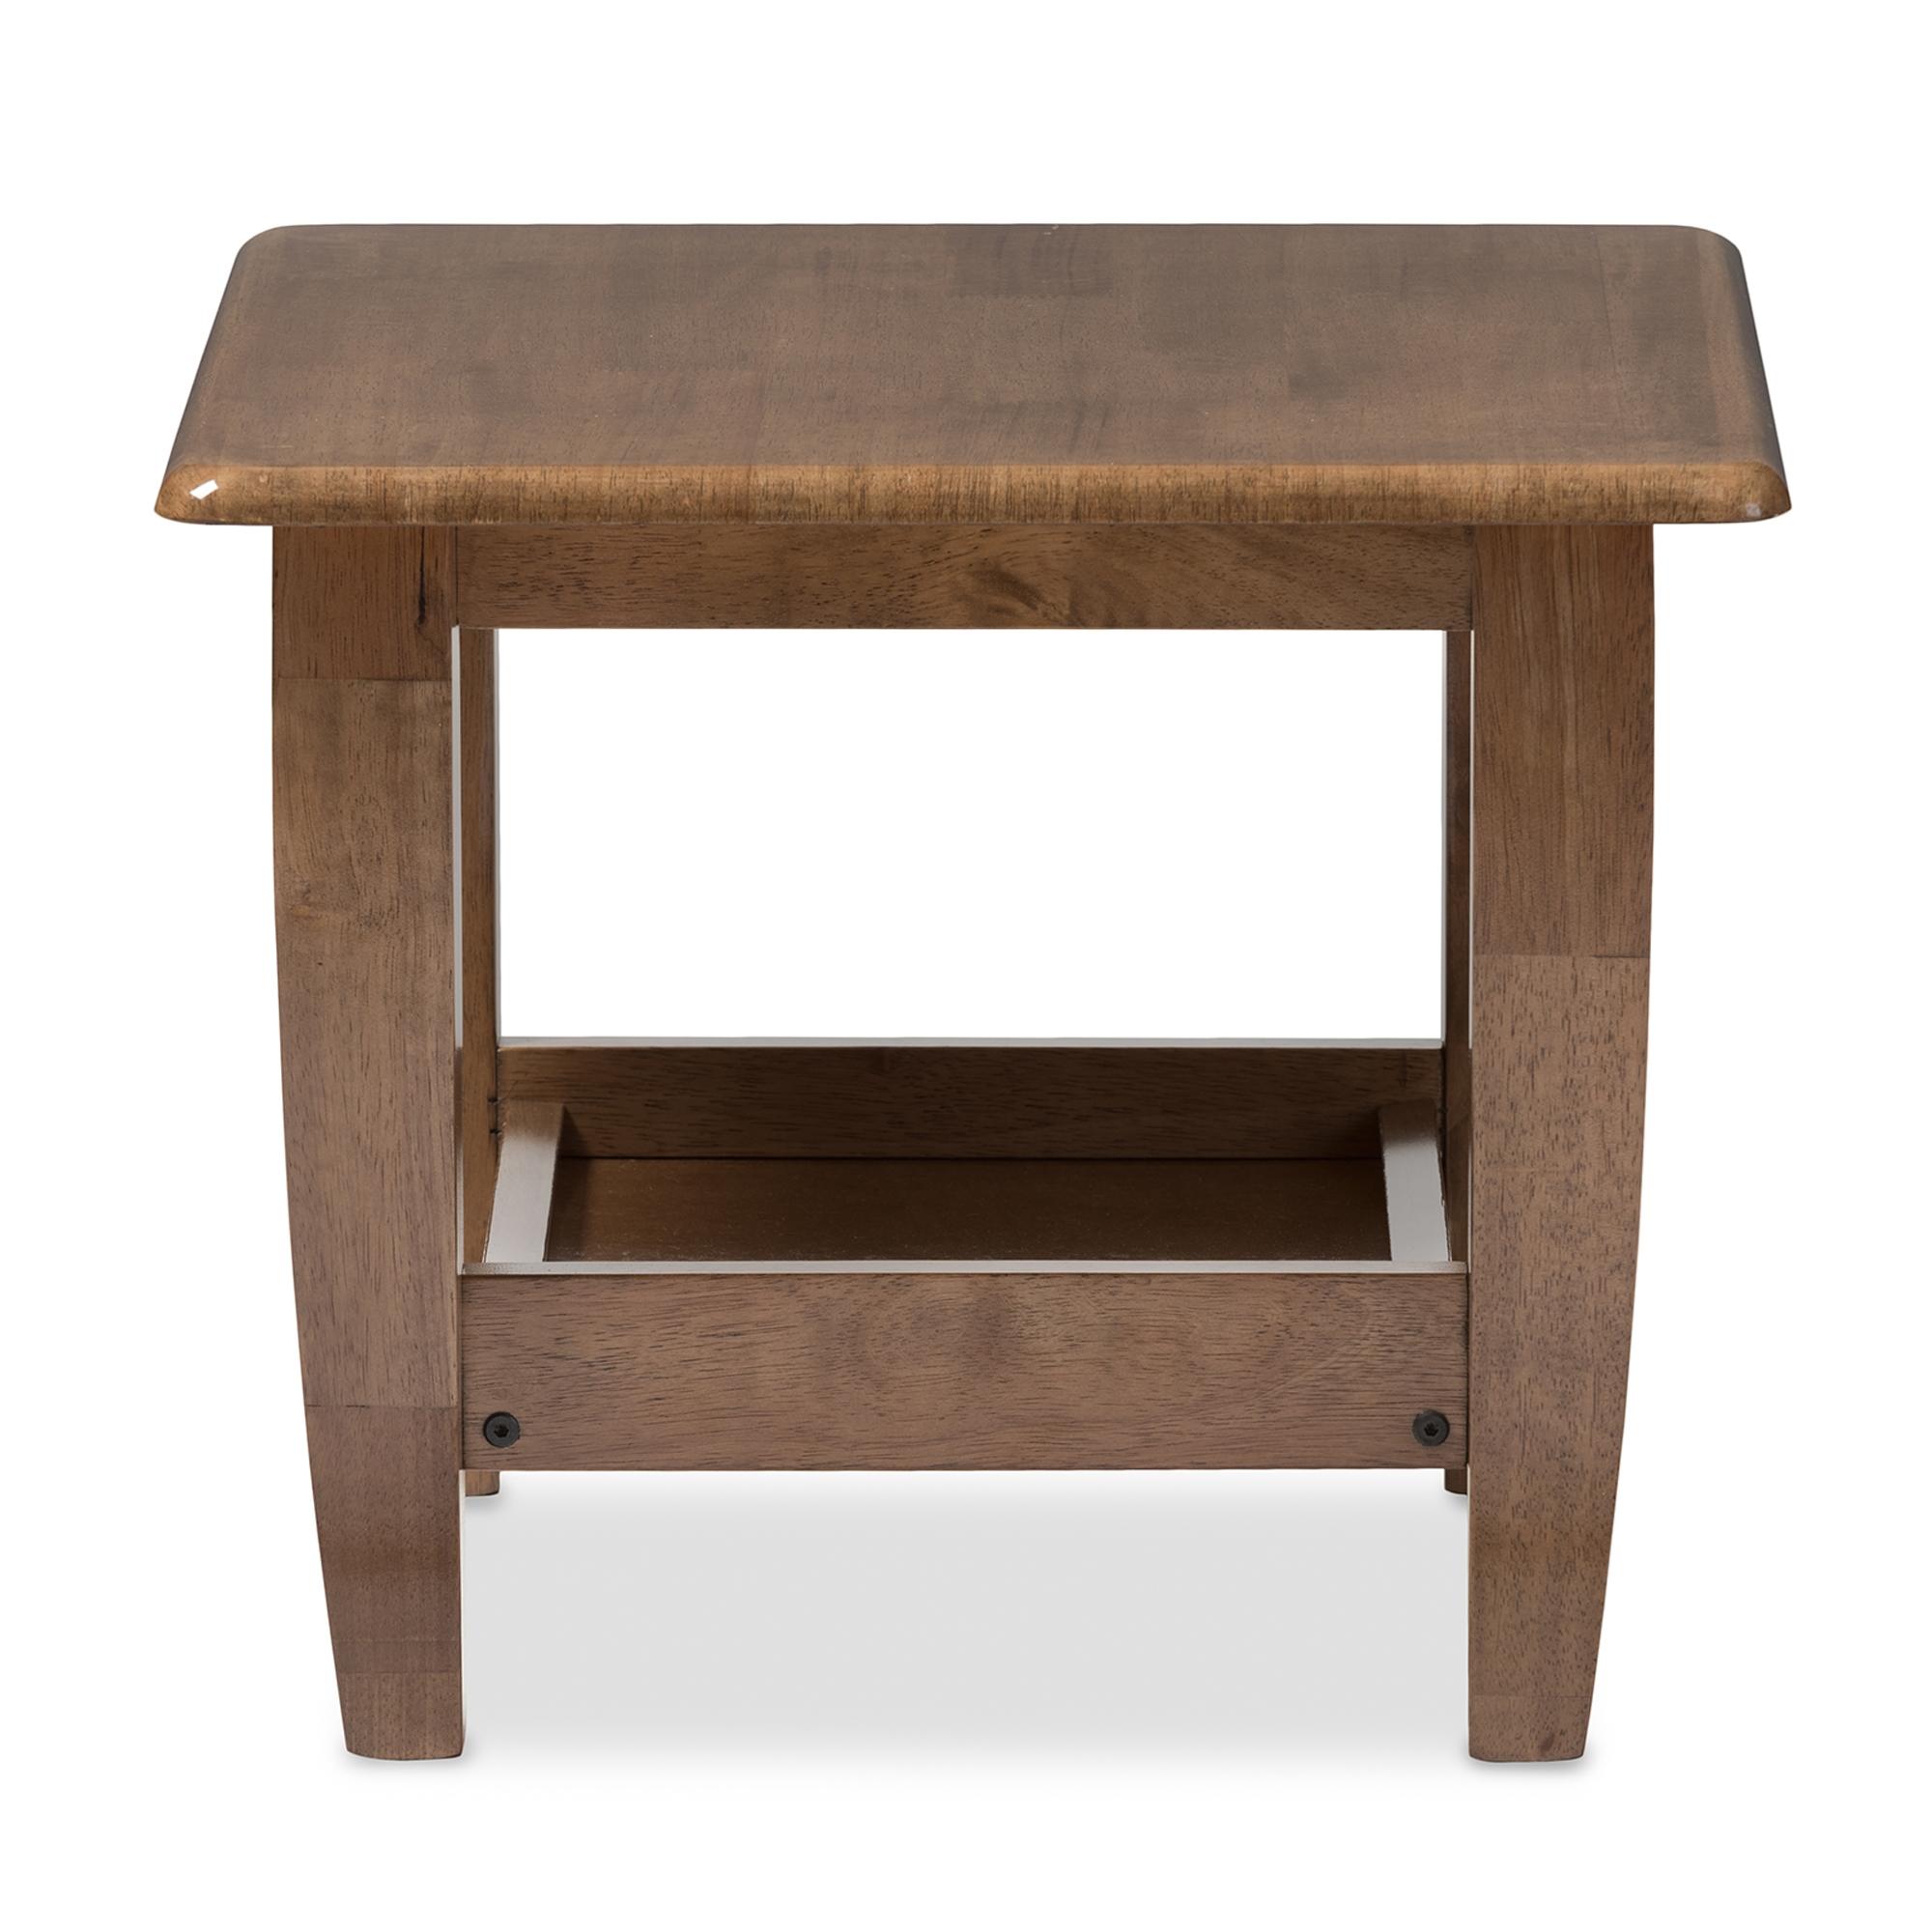 ... Baxton Studio Pierce Mid Century Modern Walnut Finished Brown Wood End  Table   BSOSW3656  ...